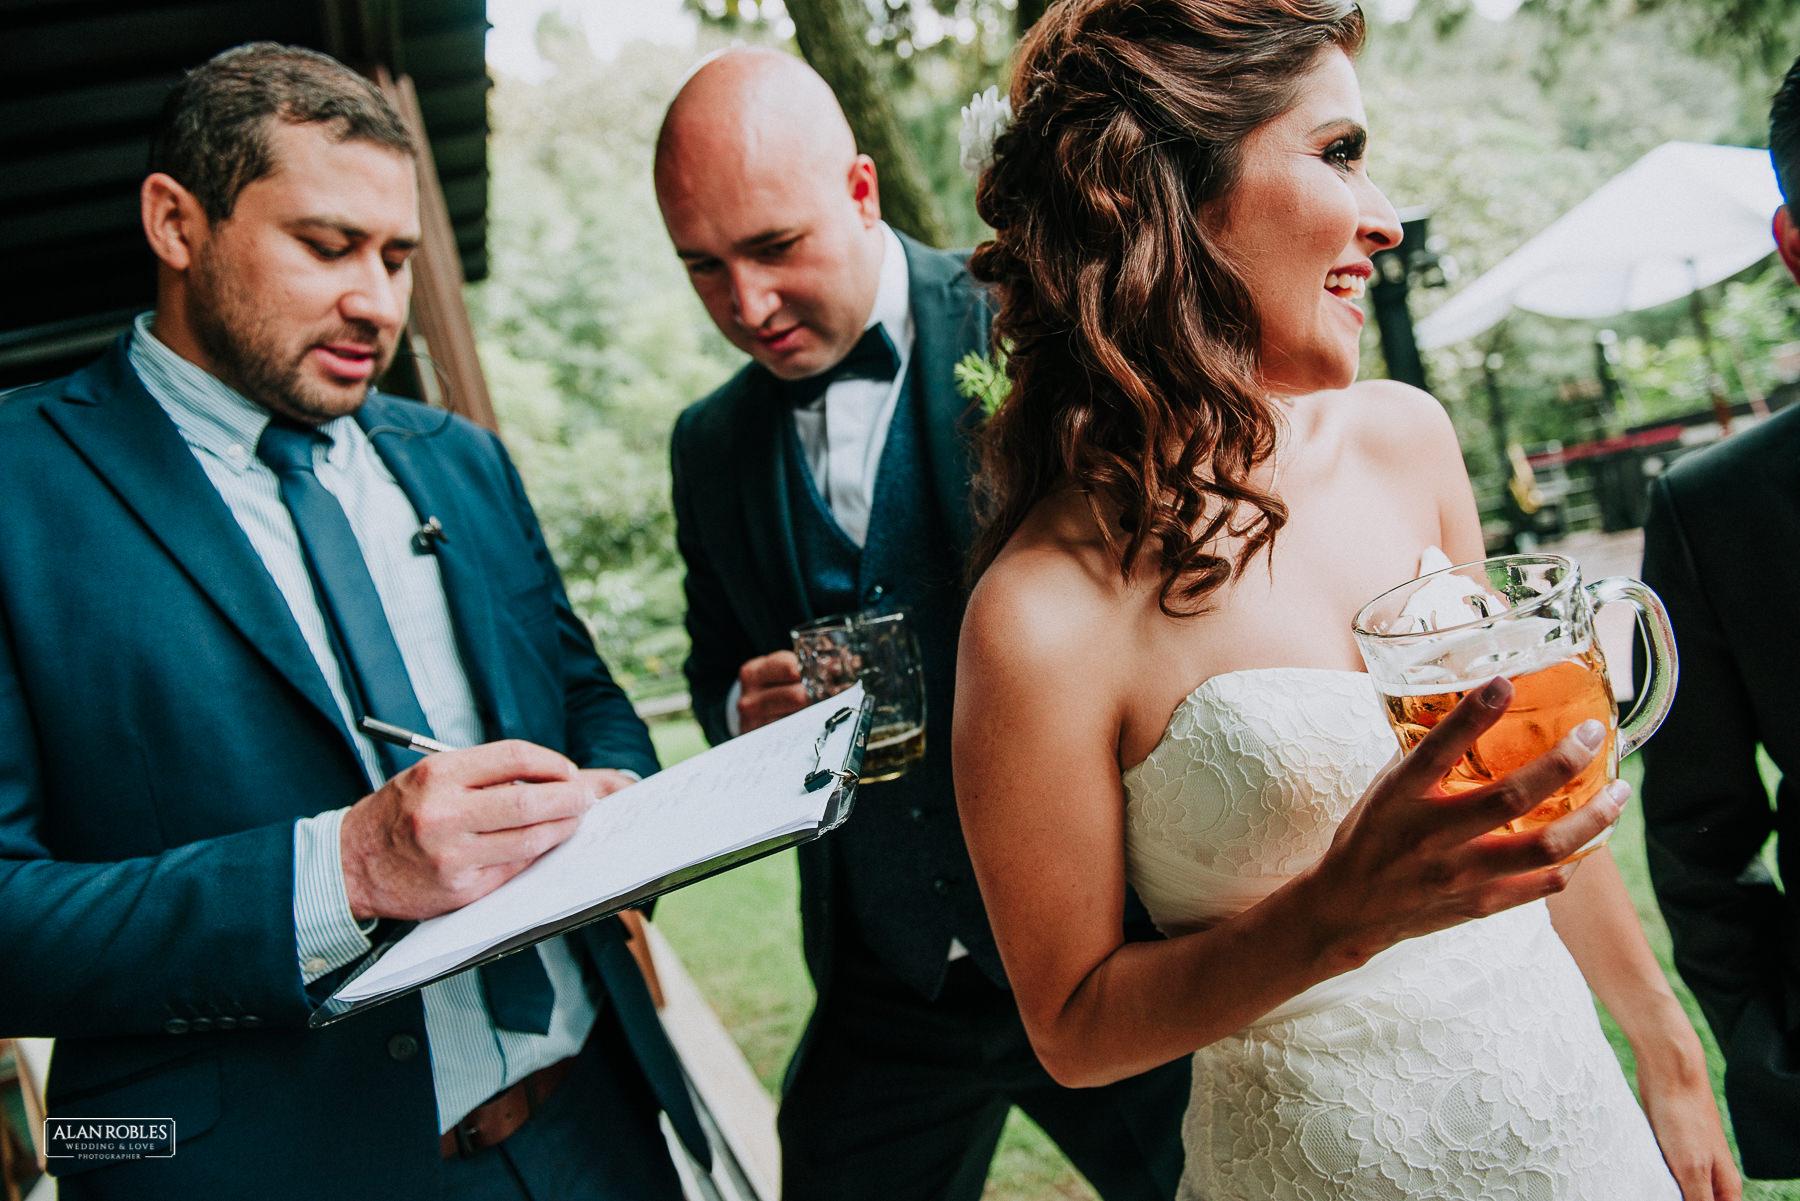 Fotografo de bodas guadalajara Alan Robles - Pinare terraza bistro 26